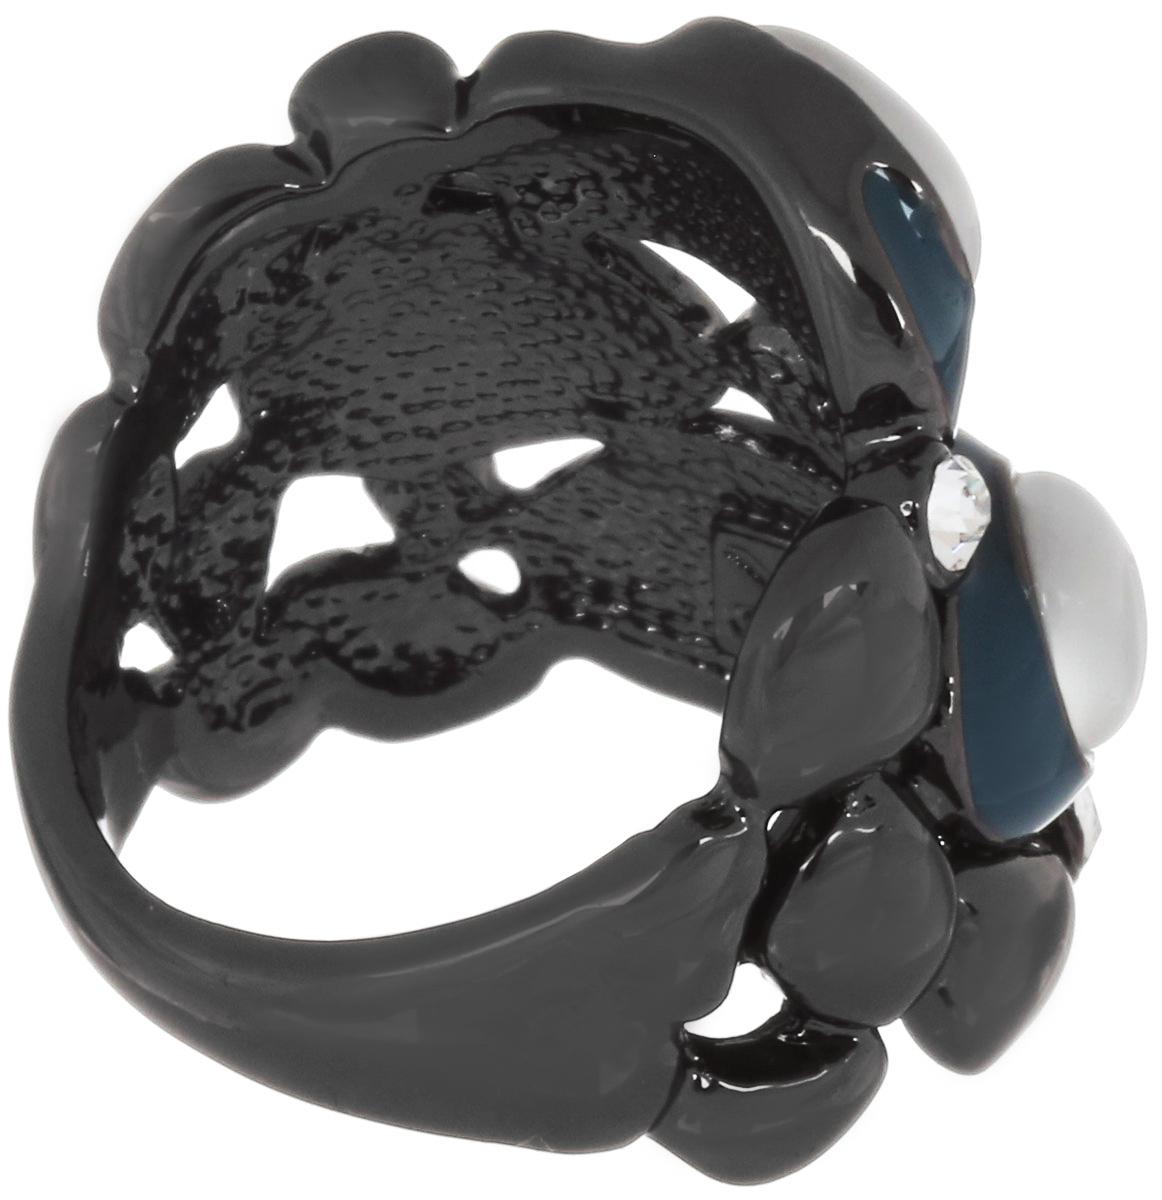 Кольцо Art-Silver, цвет: антрацитовый, серый, темно-бирюзовый. 066762-904-586. Размер 17, 5